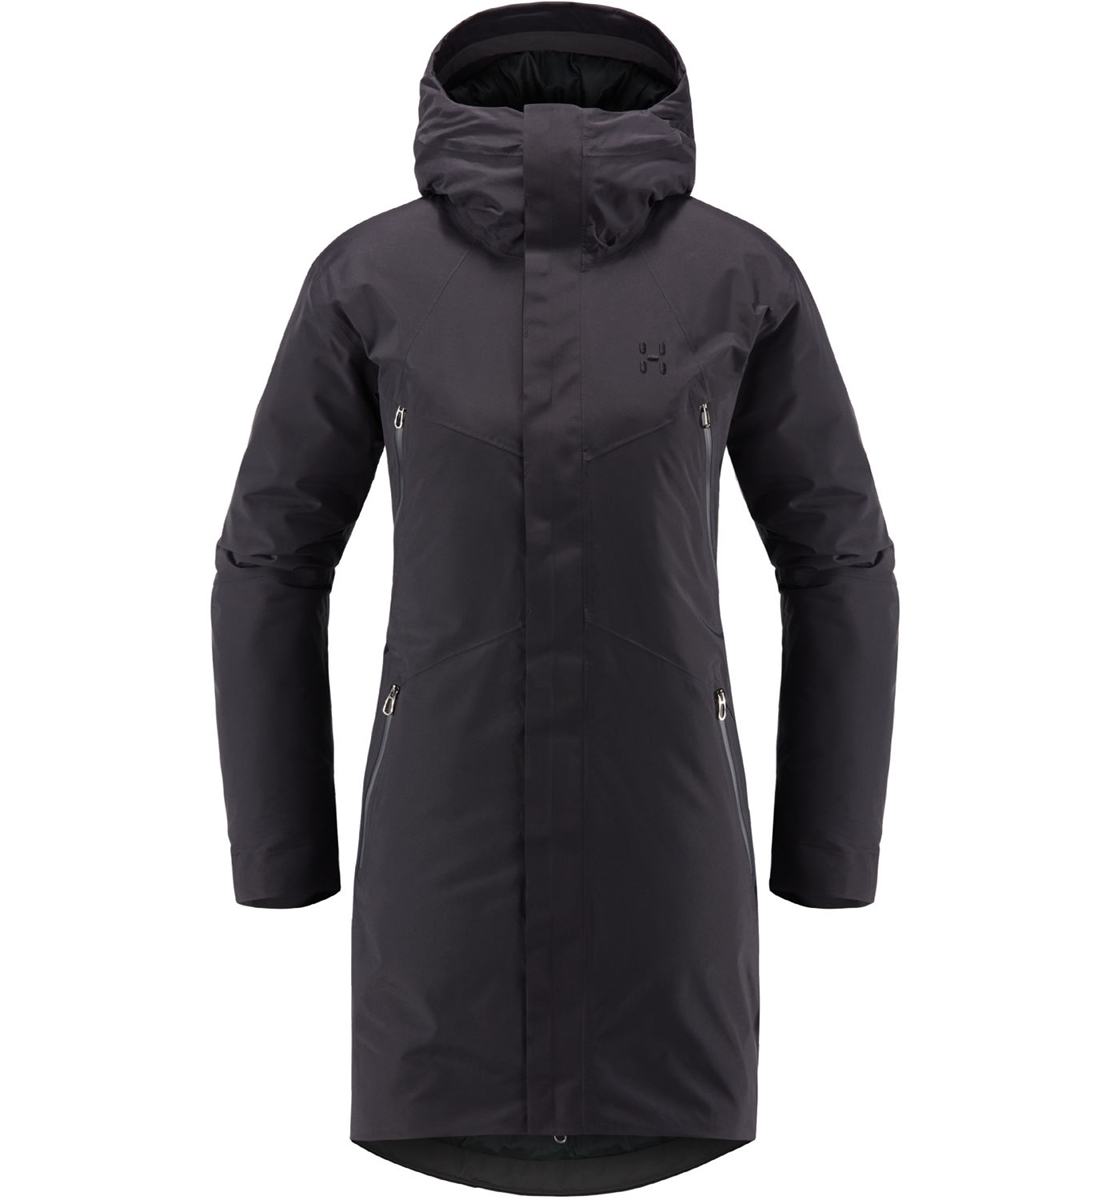 986d3414 Haglofs Furudal down Parka Woman Slate- Nava Sport - Vi selger klær ...